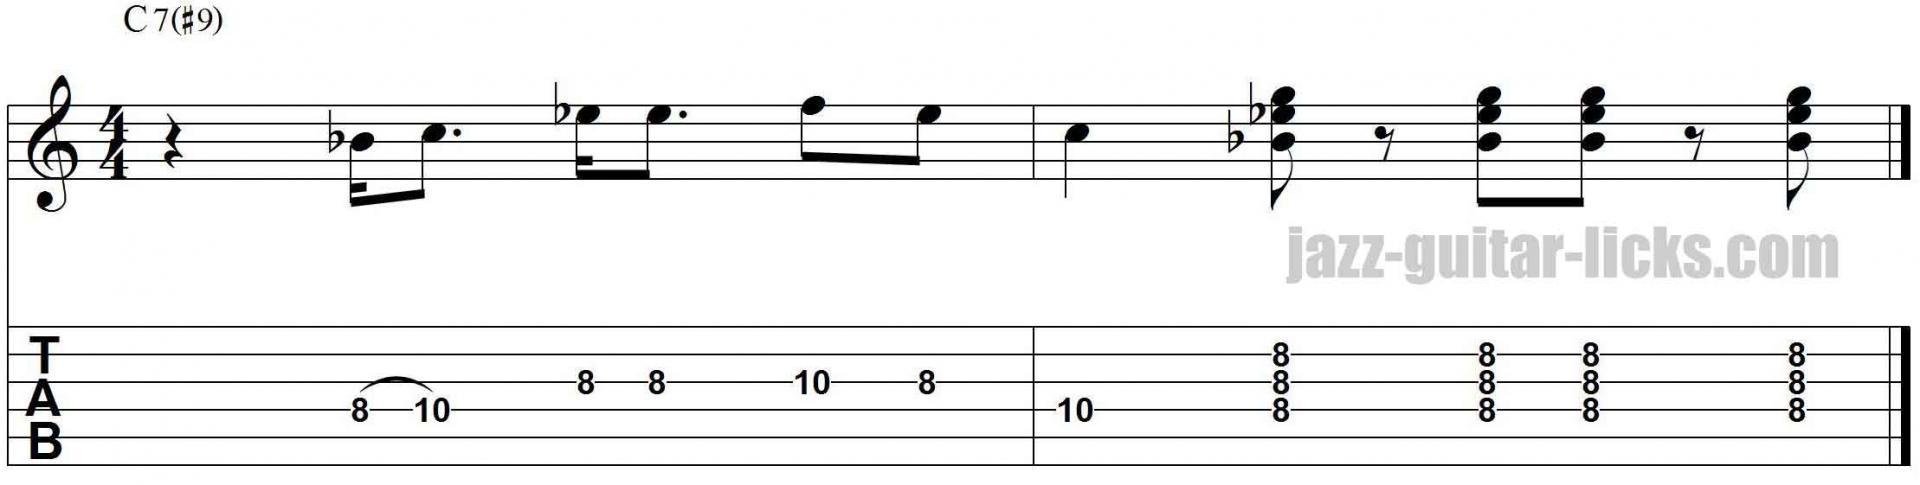 jazz blues guitar licks pdf